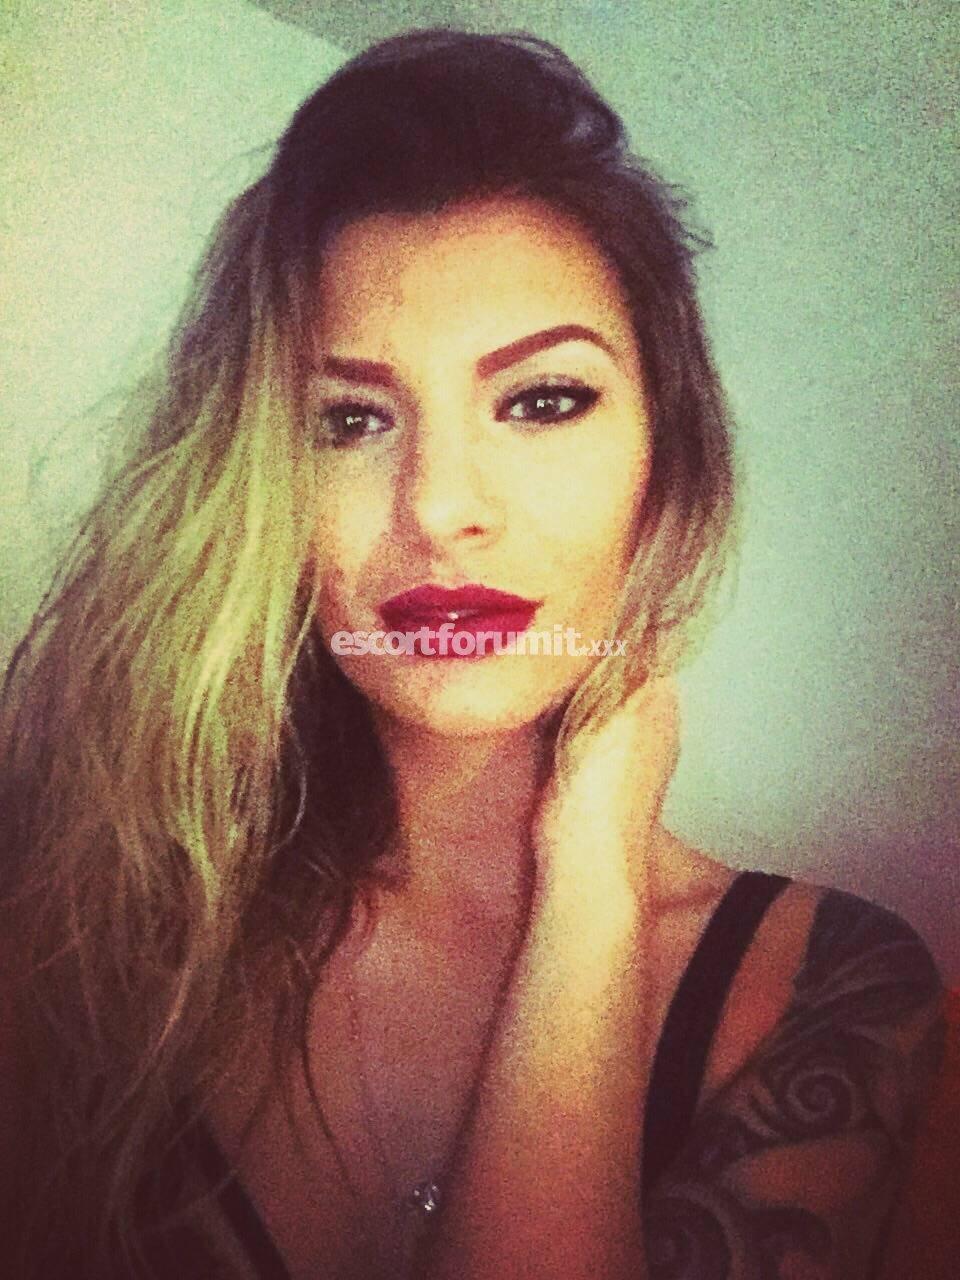 erotismo donna trovare ragazze online